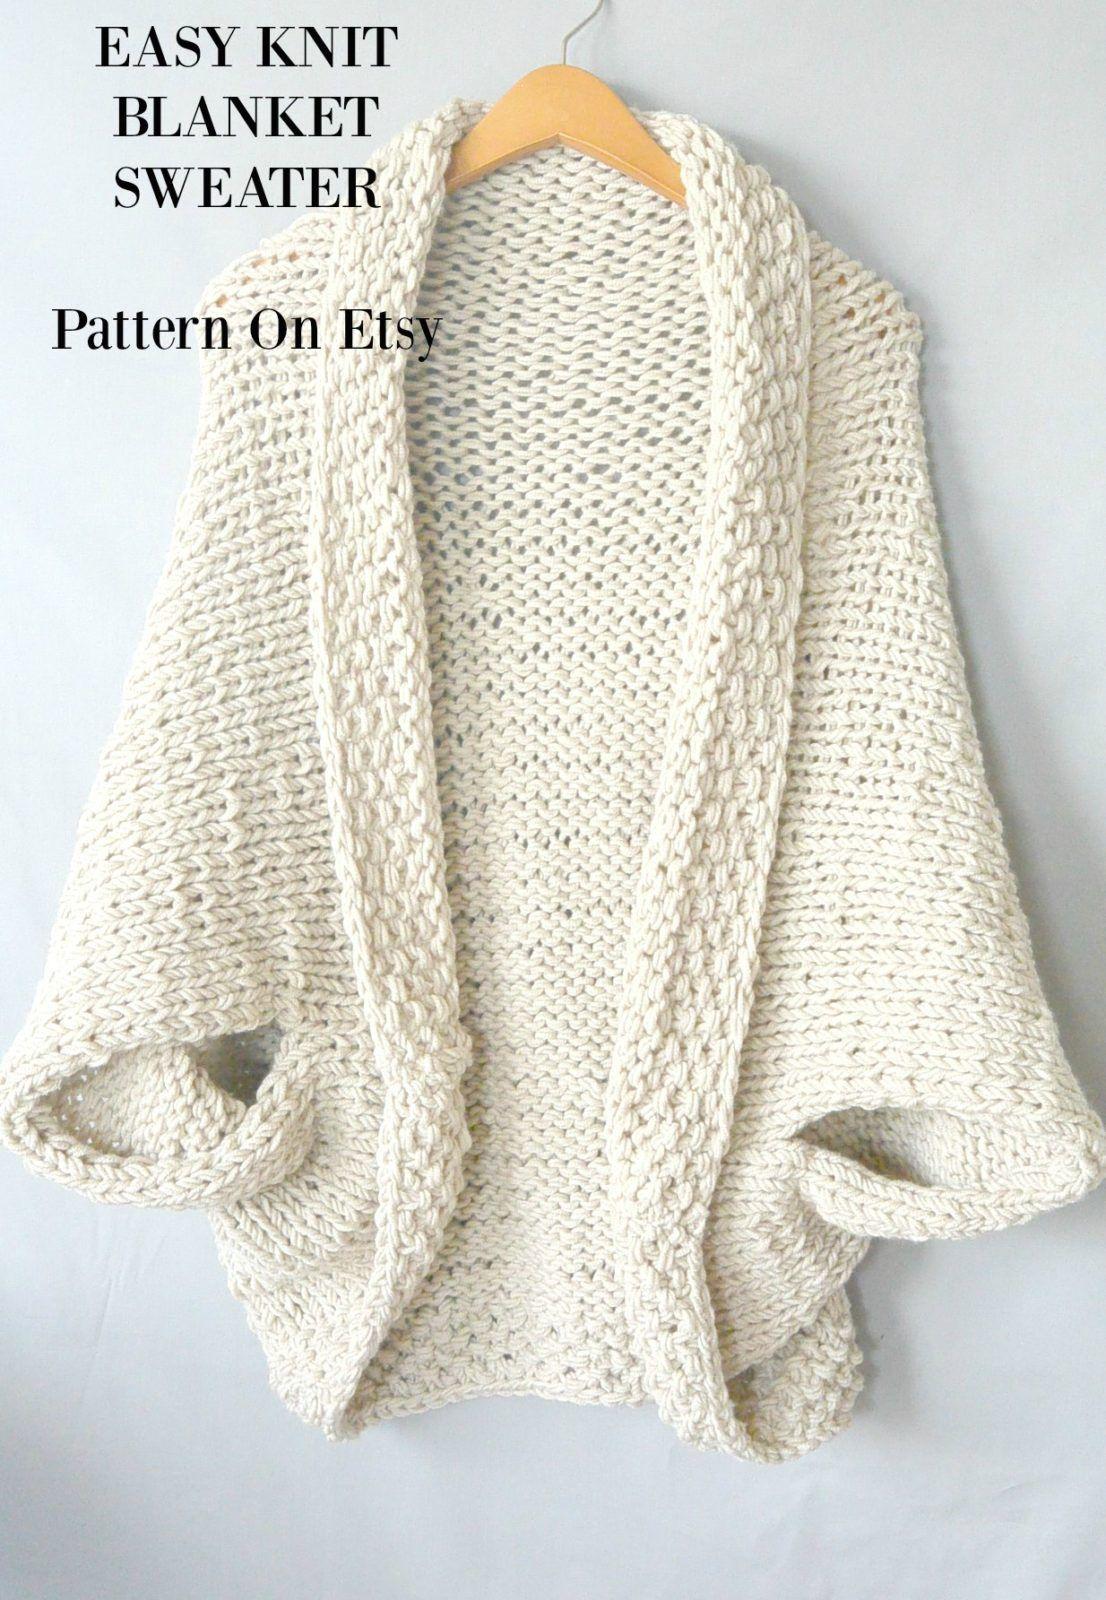 etsy-easy-knit-blanket-sweater-lb-5 | Knitting, Yarn, Crochet ...